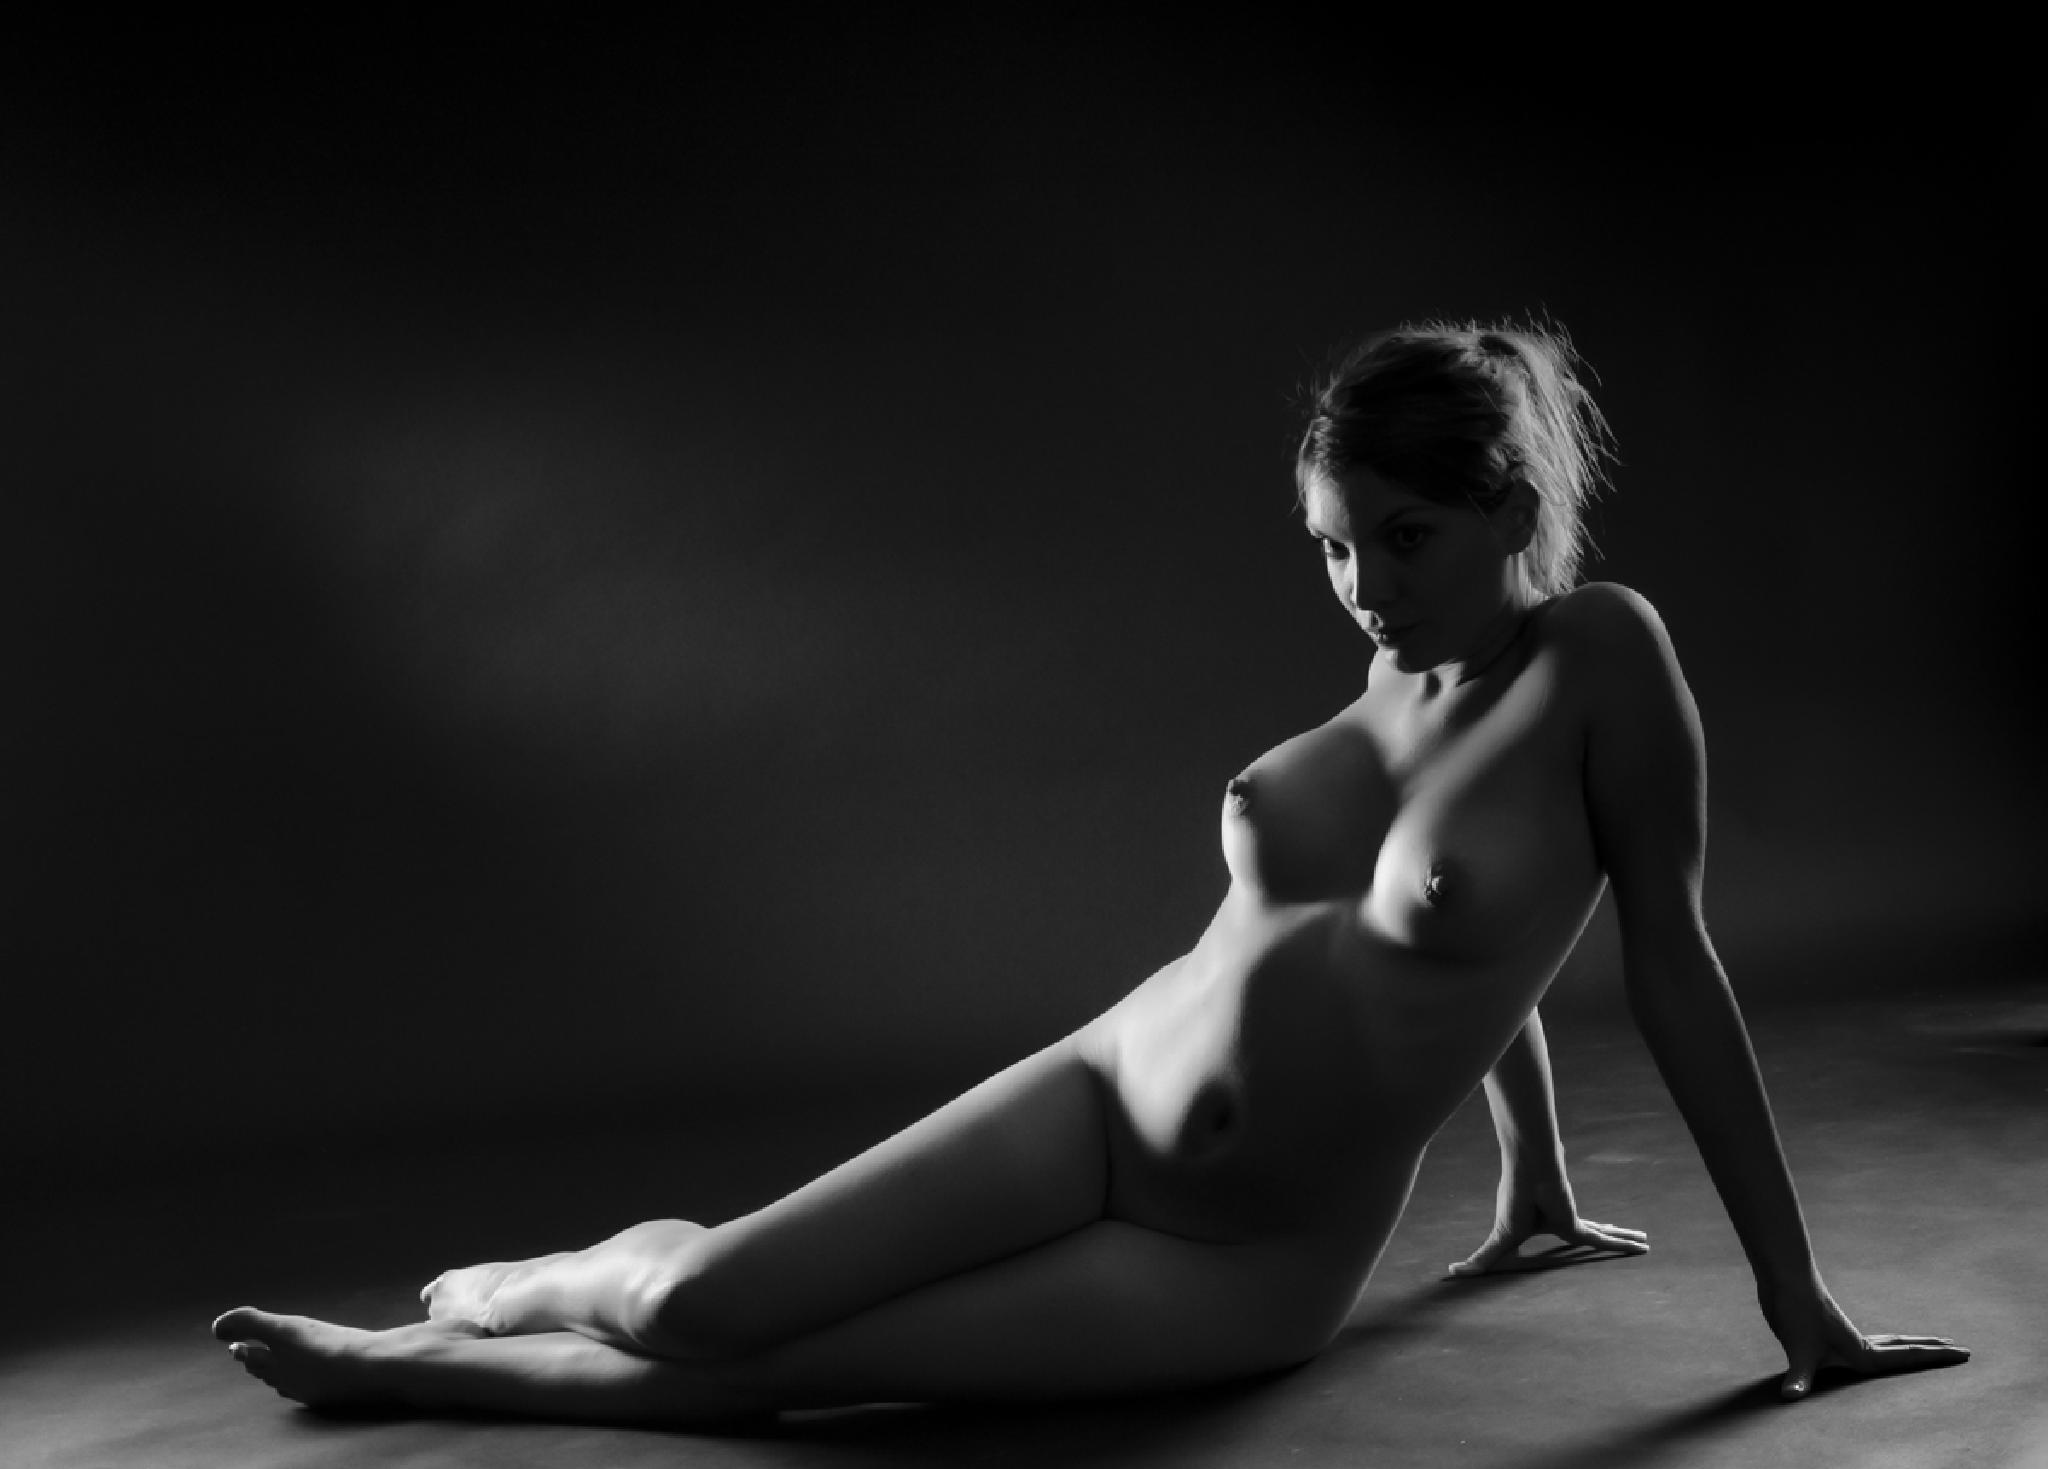 Body  of Light by yves0206